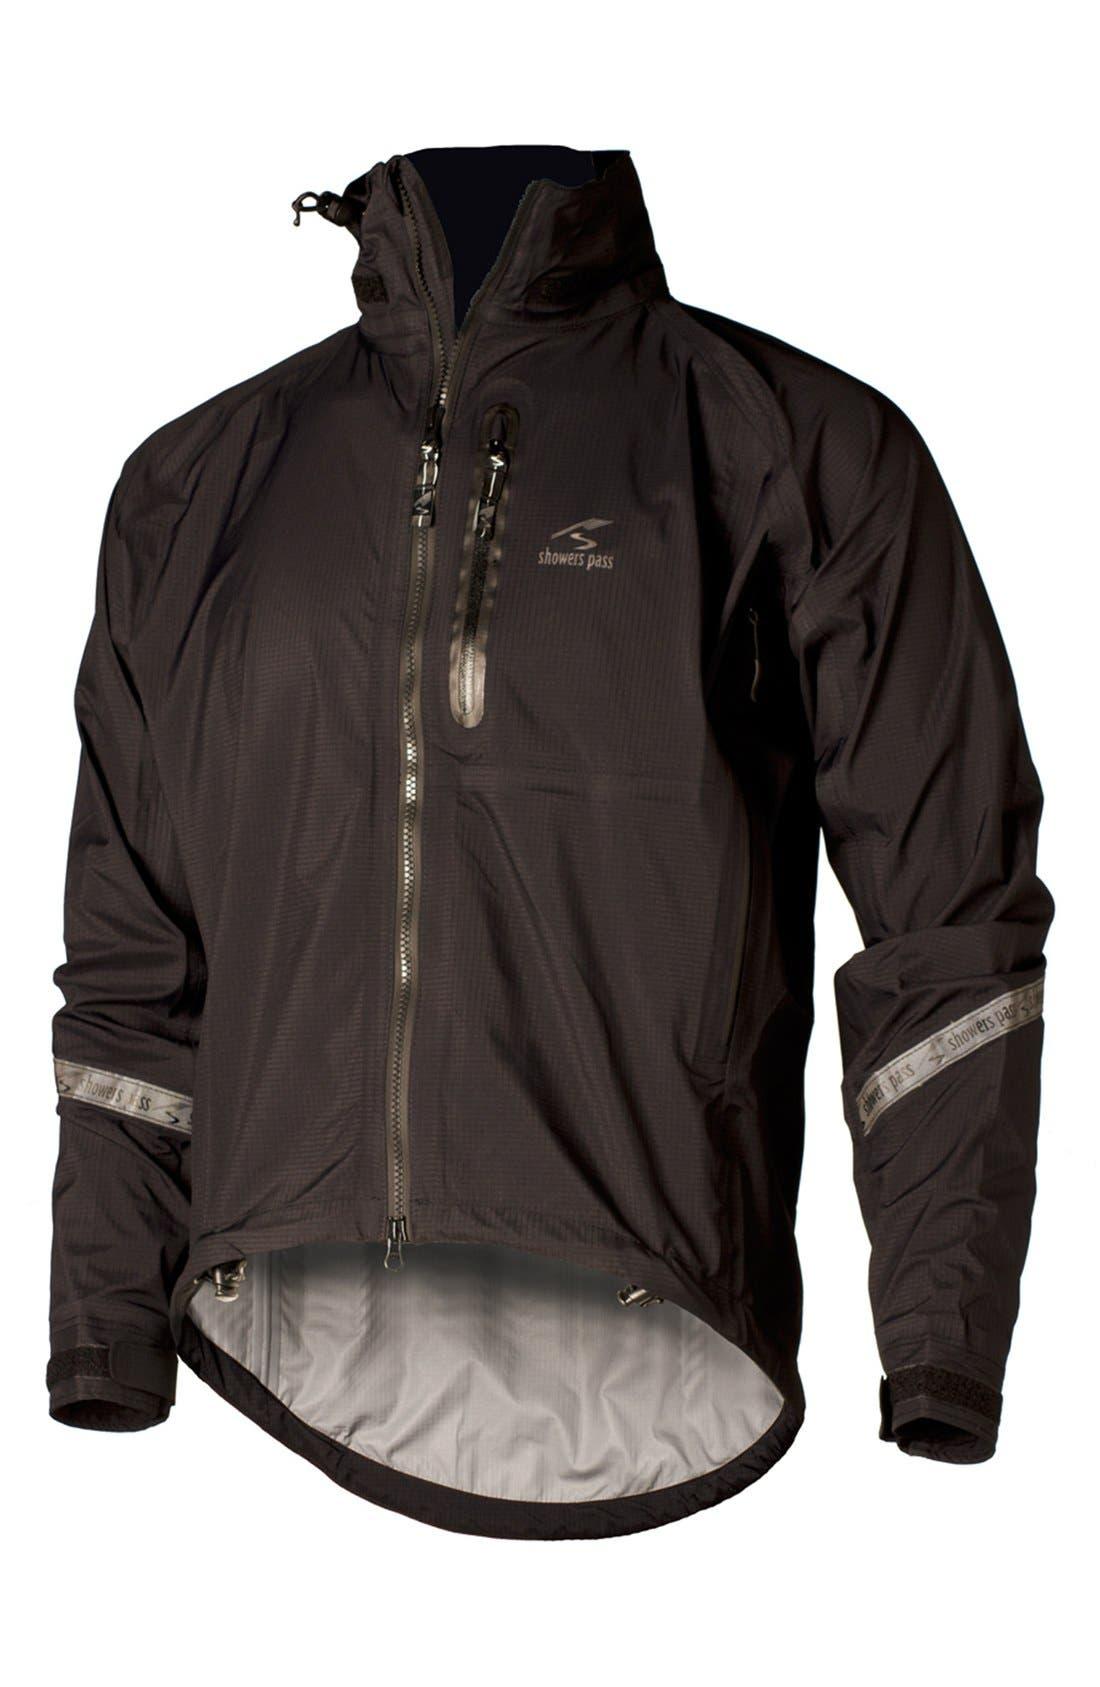 SHOWERS PASS,                             'Elite 2.1' Trim Fit Waterproof Hooded Jacket,                             Alternate thumbnail 3, color,                             001